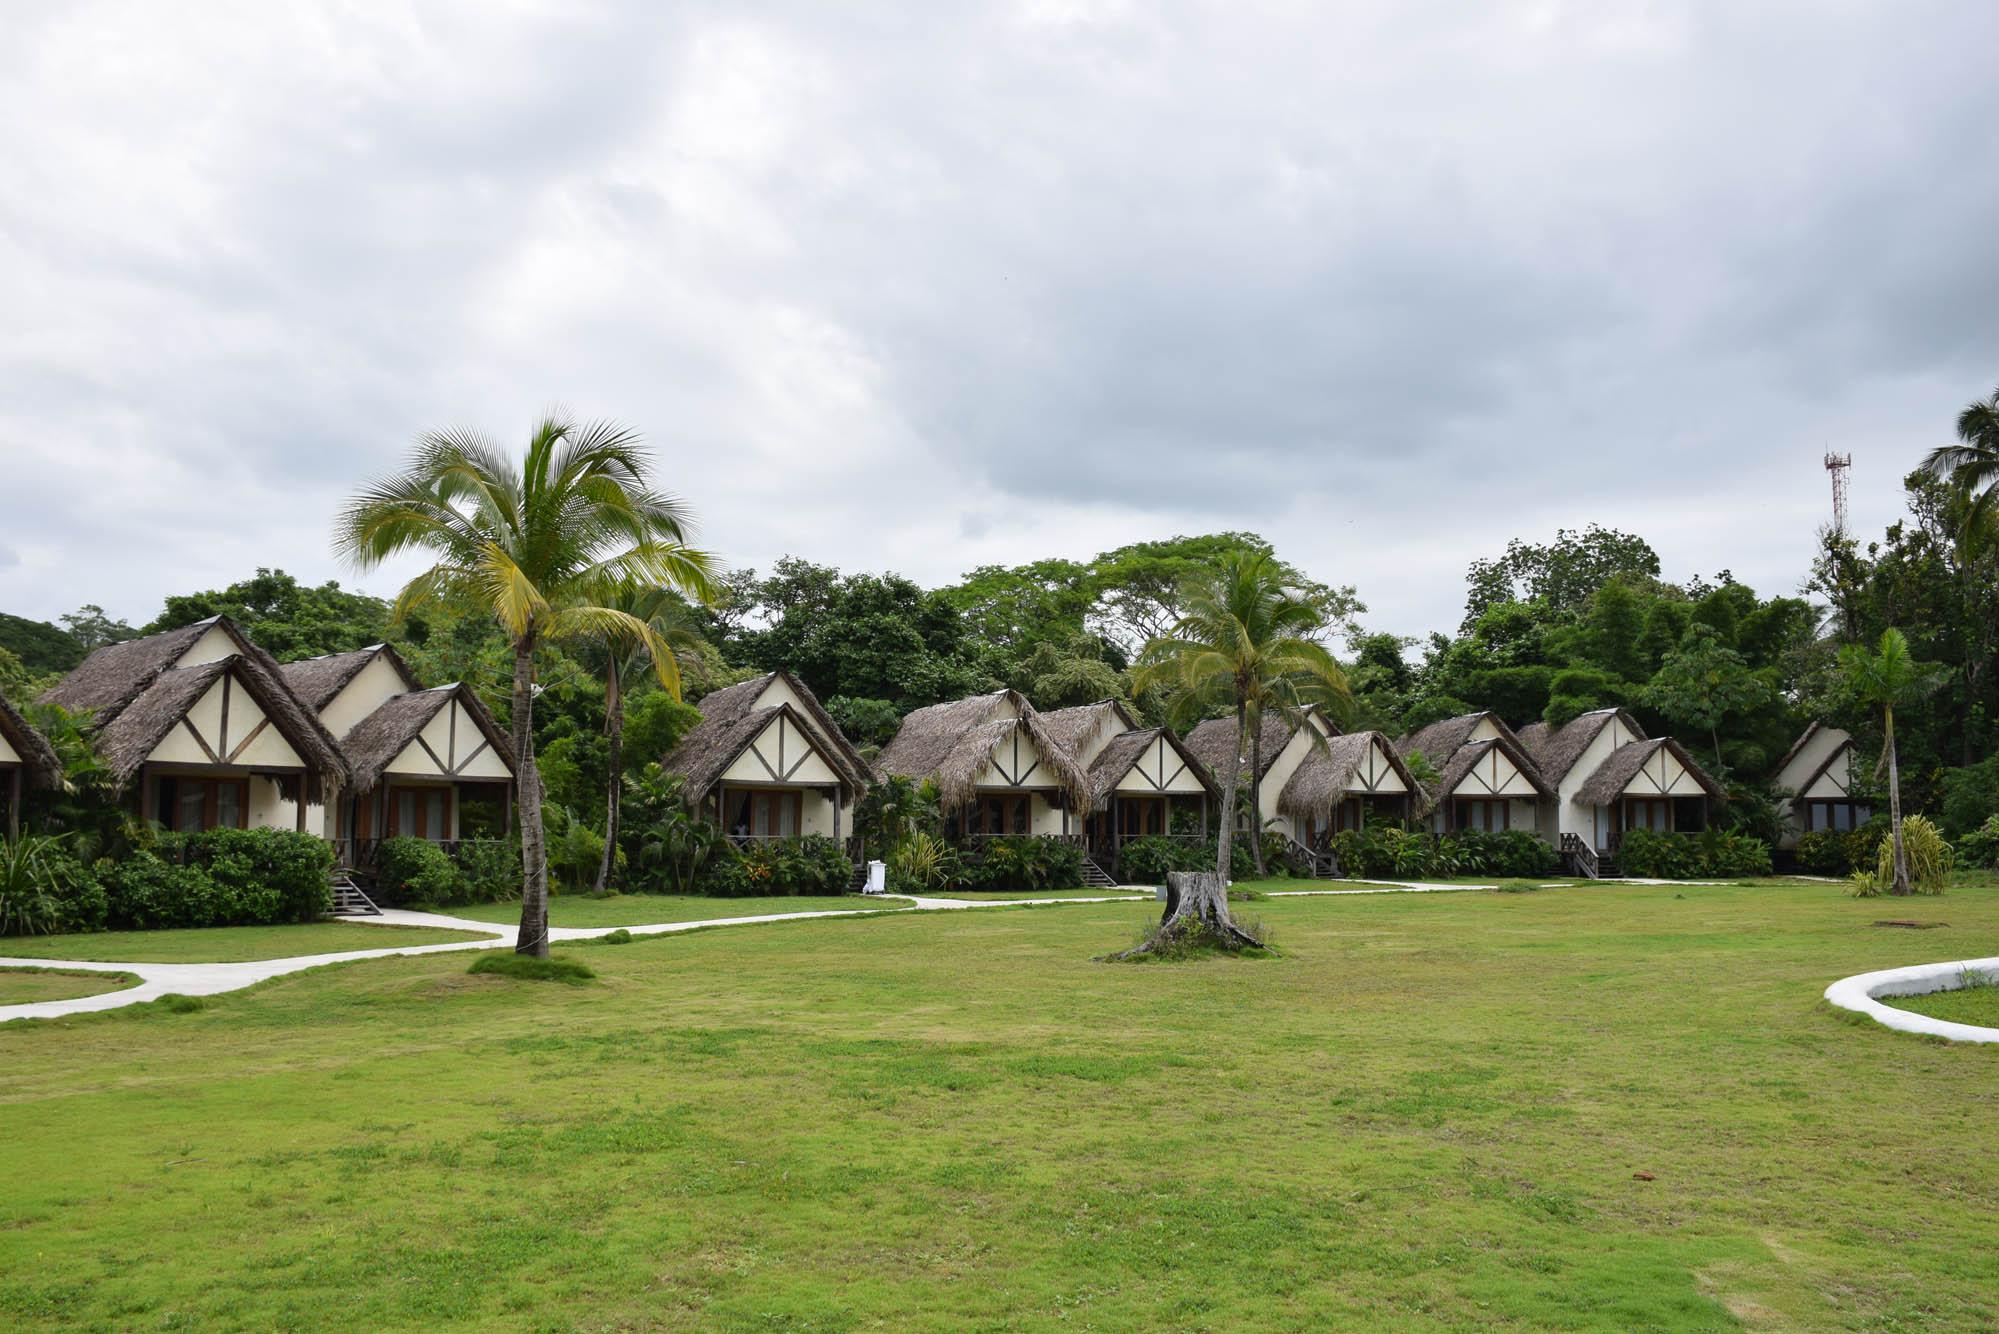 Pedasi-Isla-Iguana-Panama-Andromeda-Playa-Venao-LalaRebelo_0395